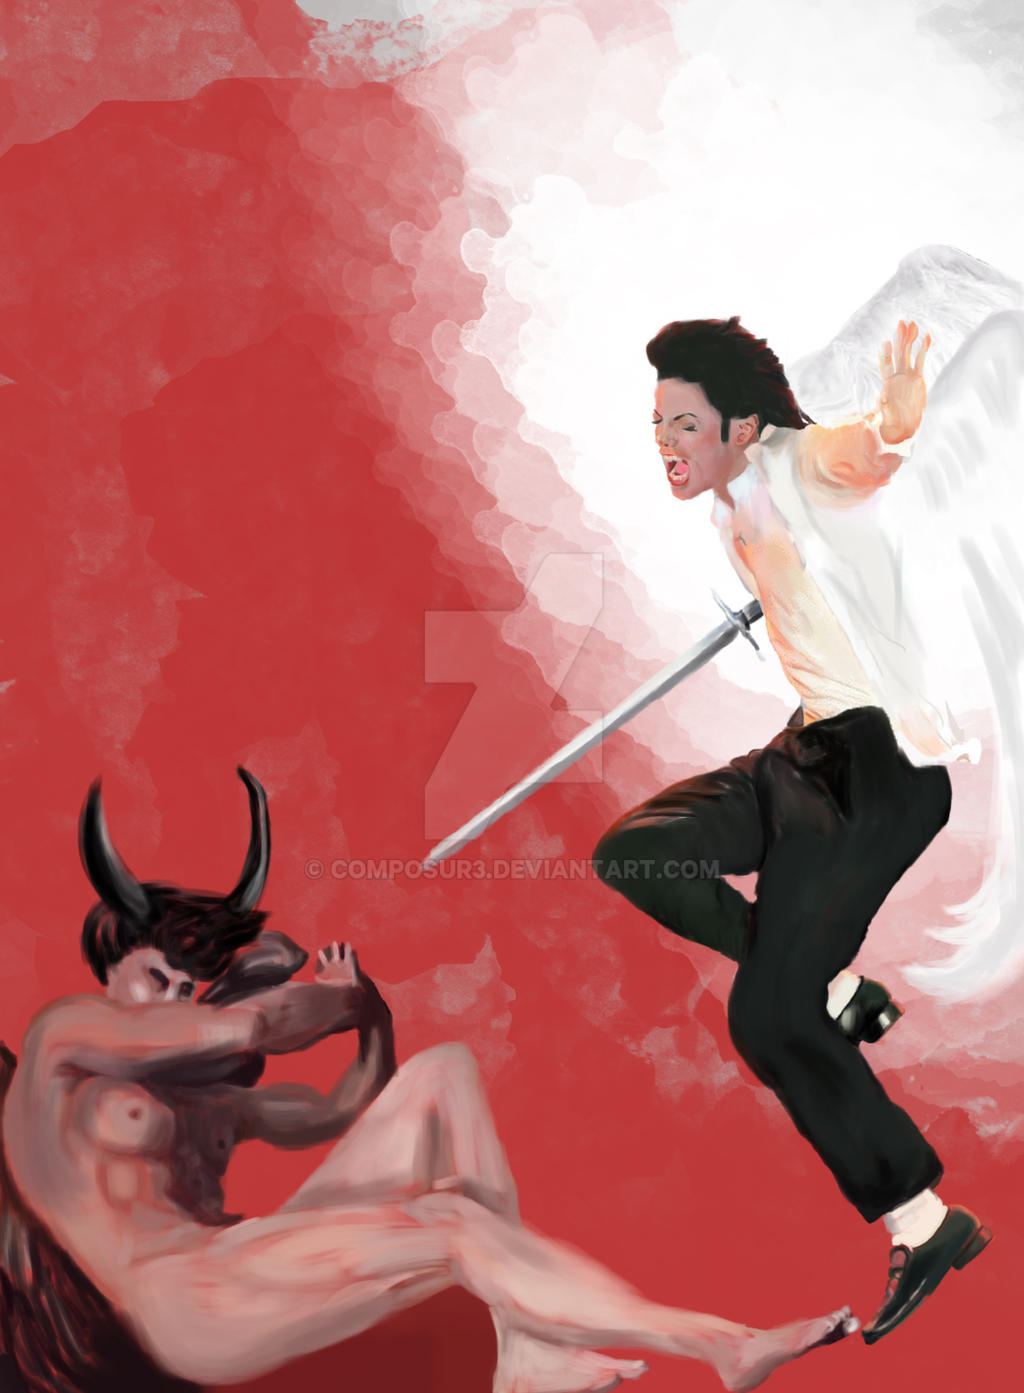 archangel michael vs archangel lucifer painting by